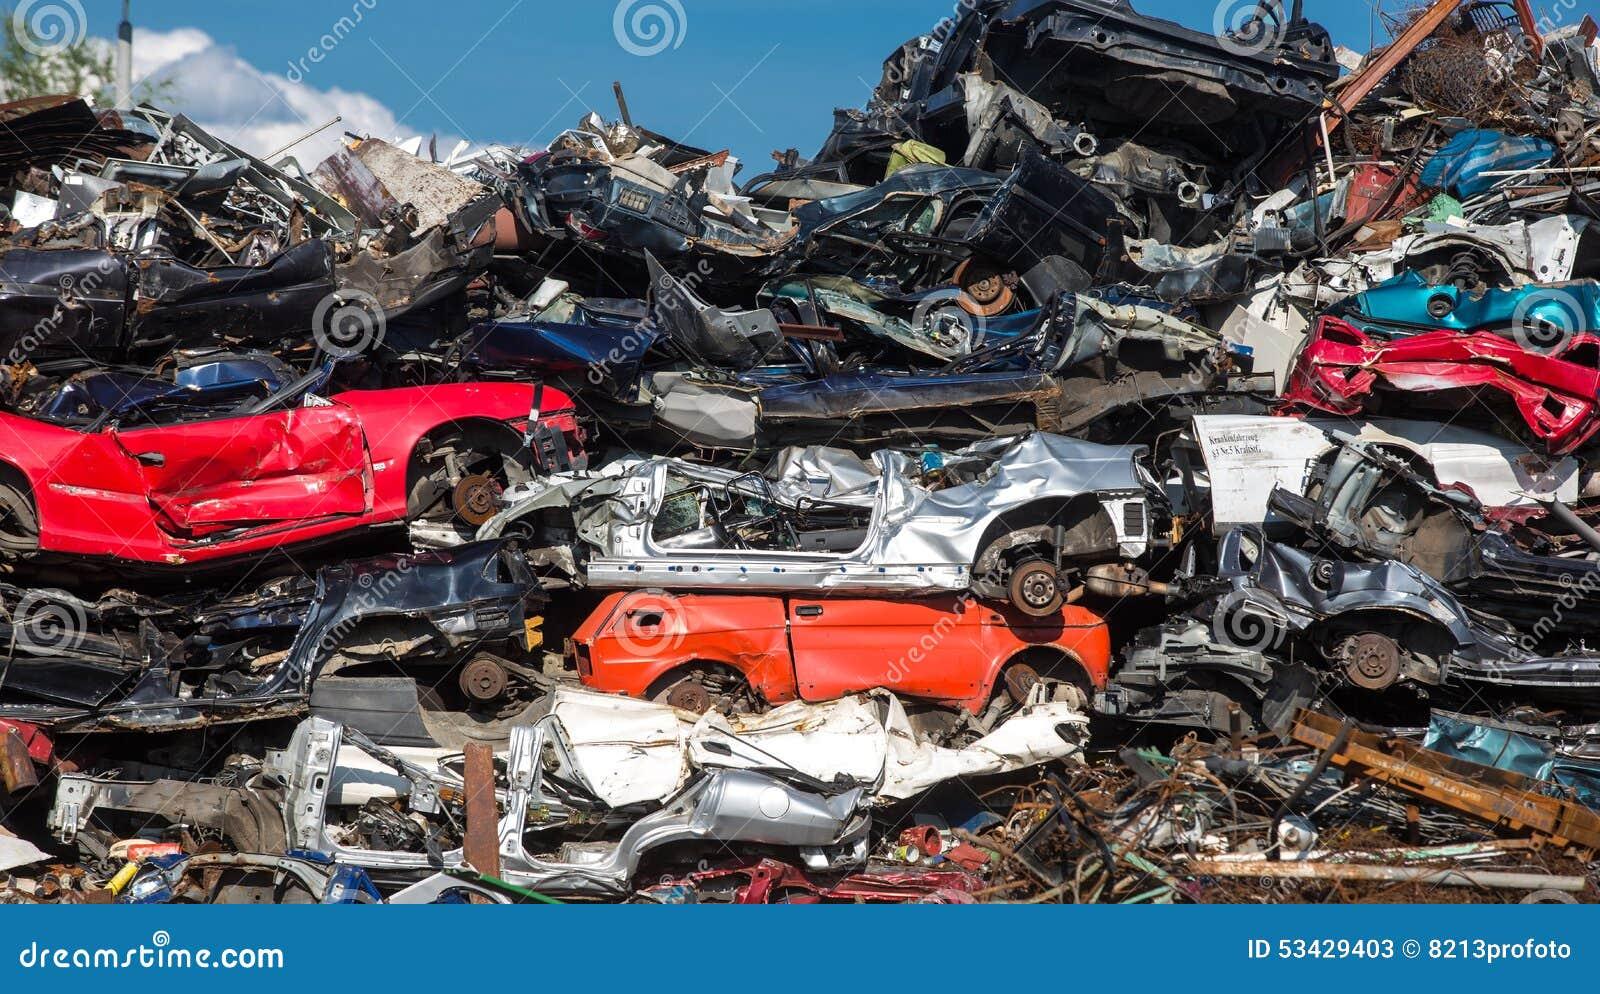 Pile Of Used Cars, Car Scrap Yard Stock Image - Image of ...